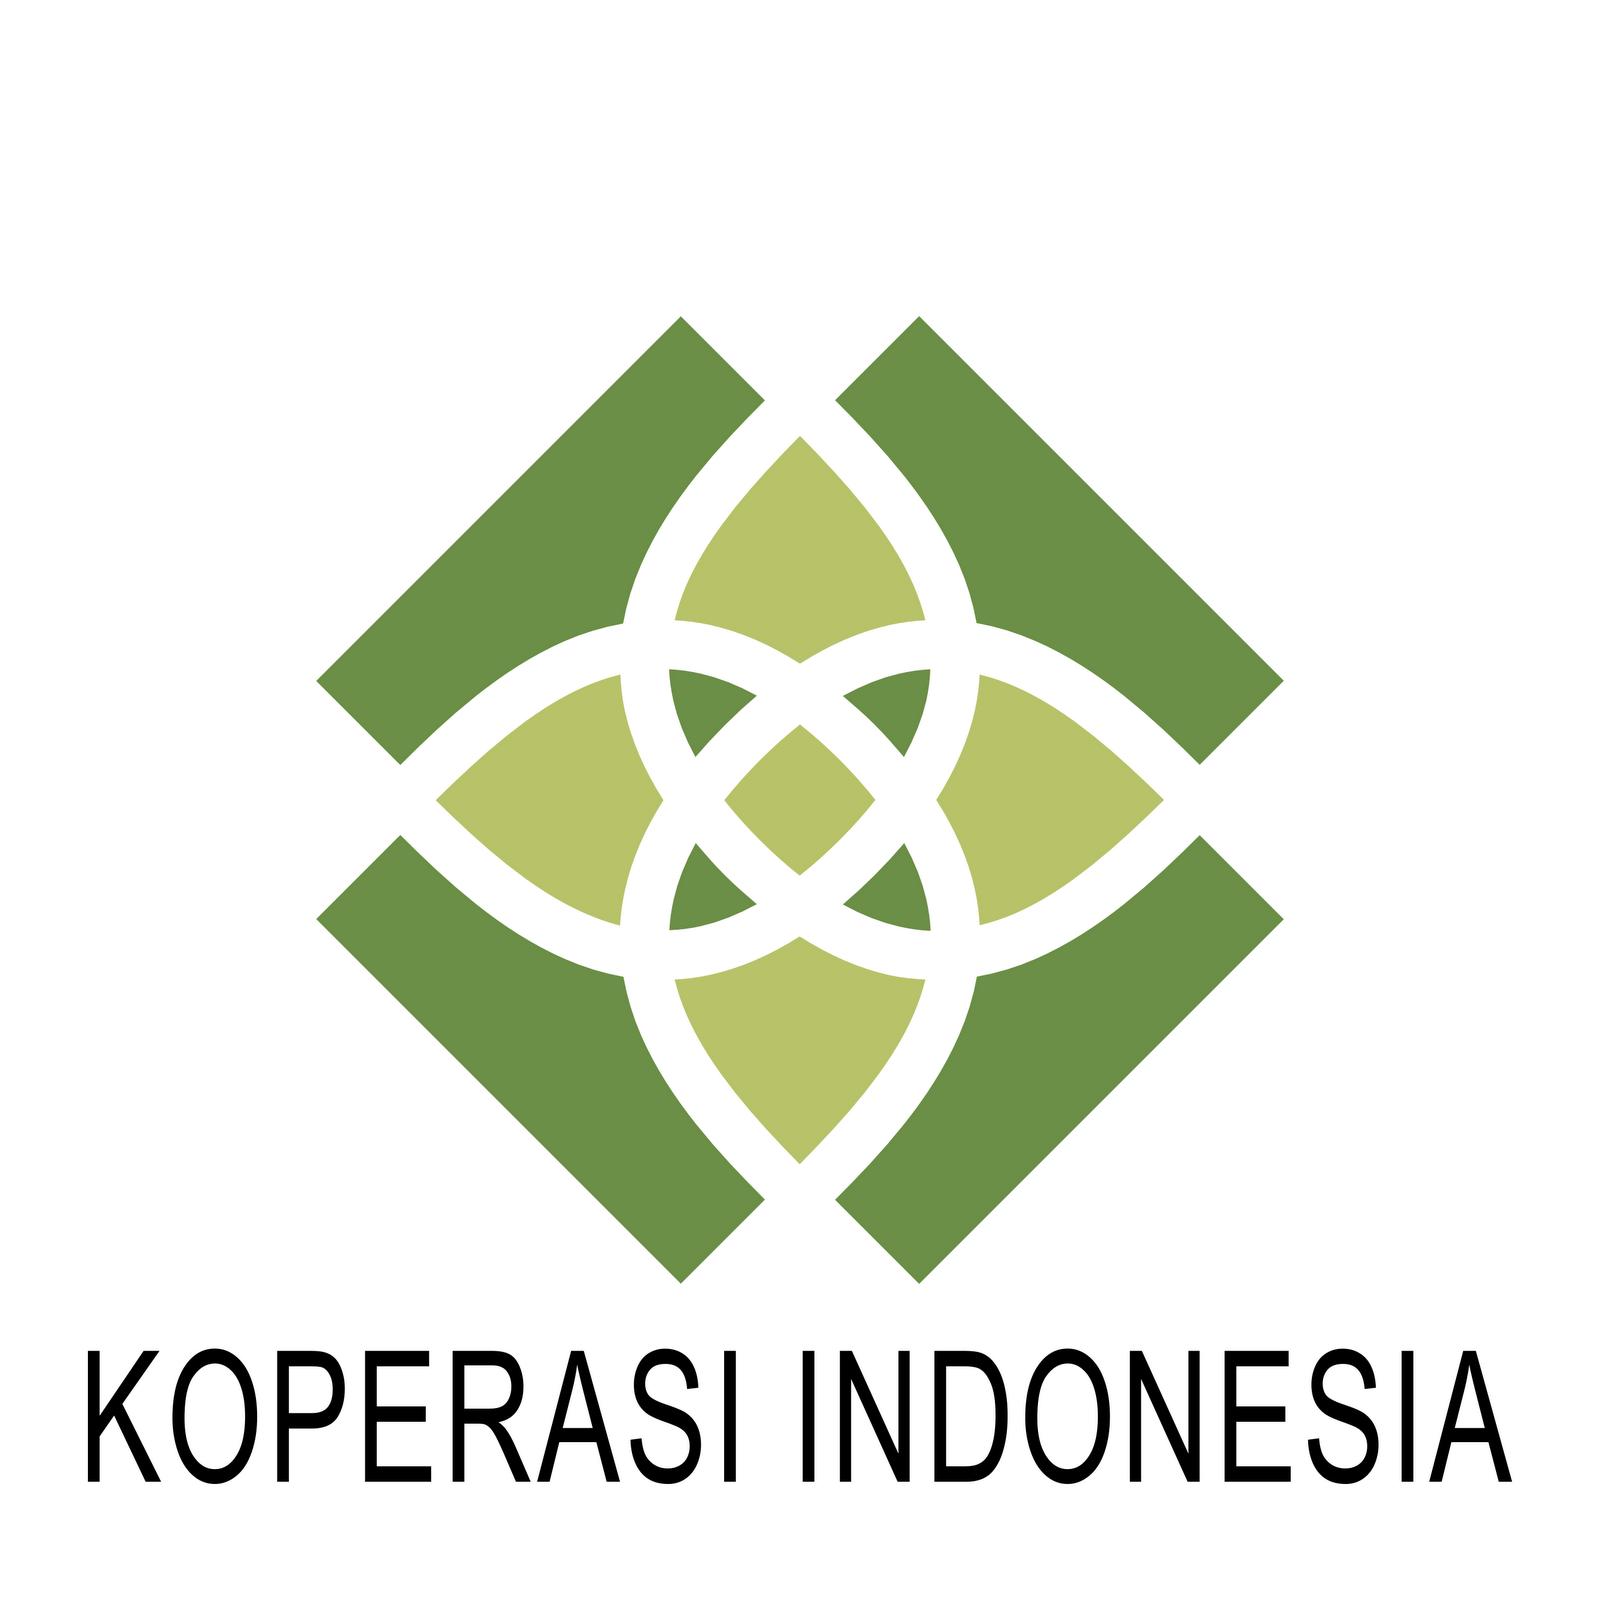 logo depag logo karang taruna logo dpu